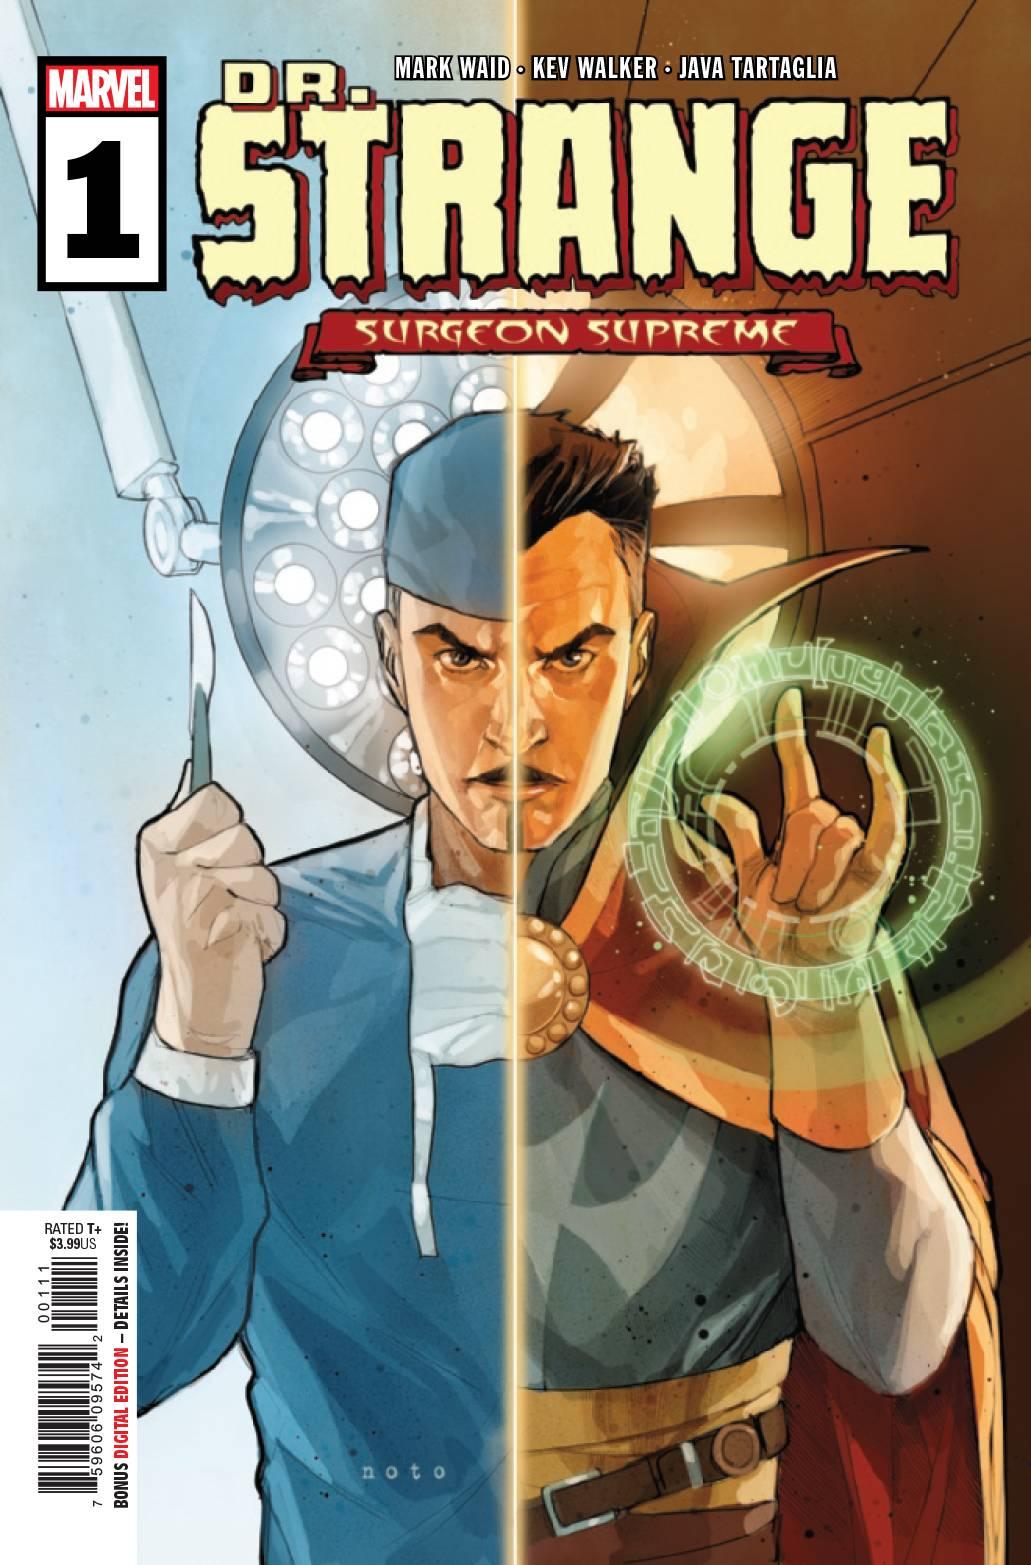 Dr. Strange: Surgeon Supreme #1 (2019)